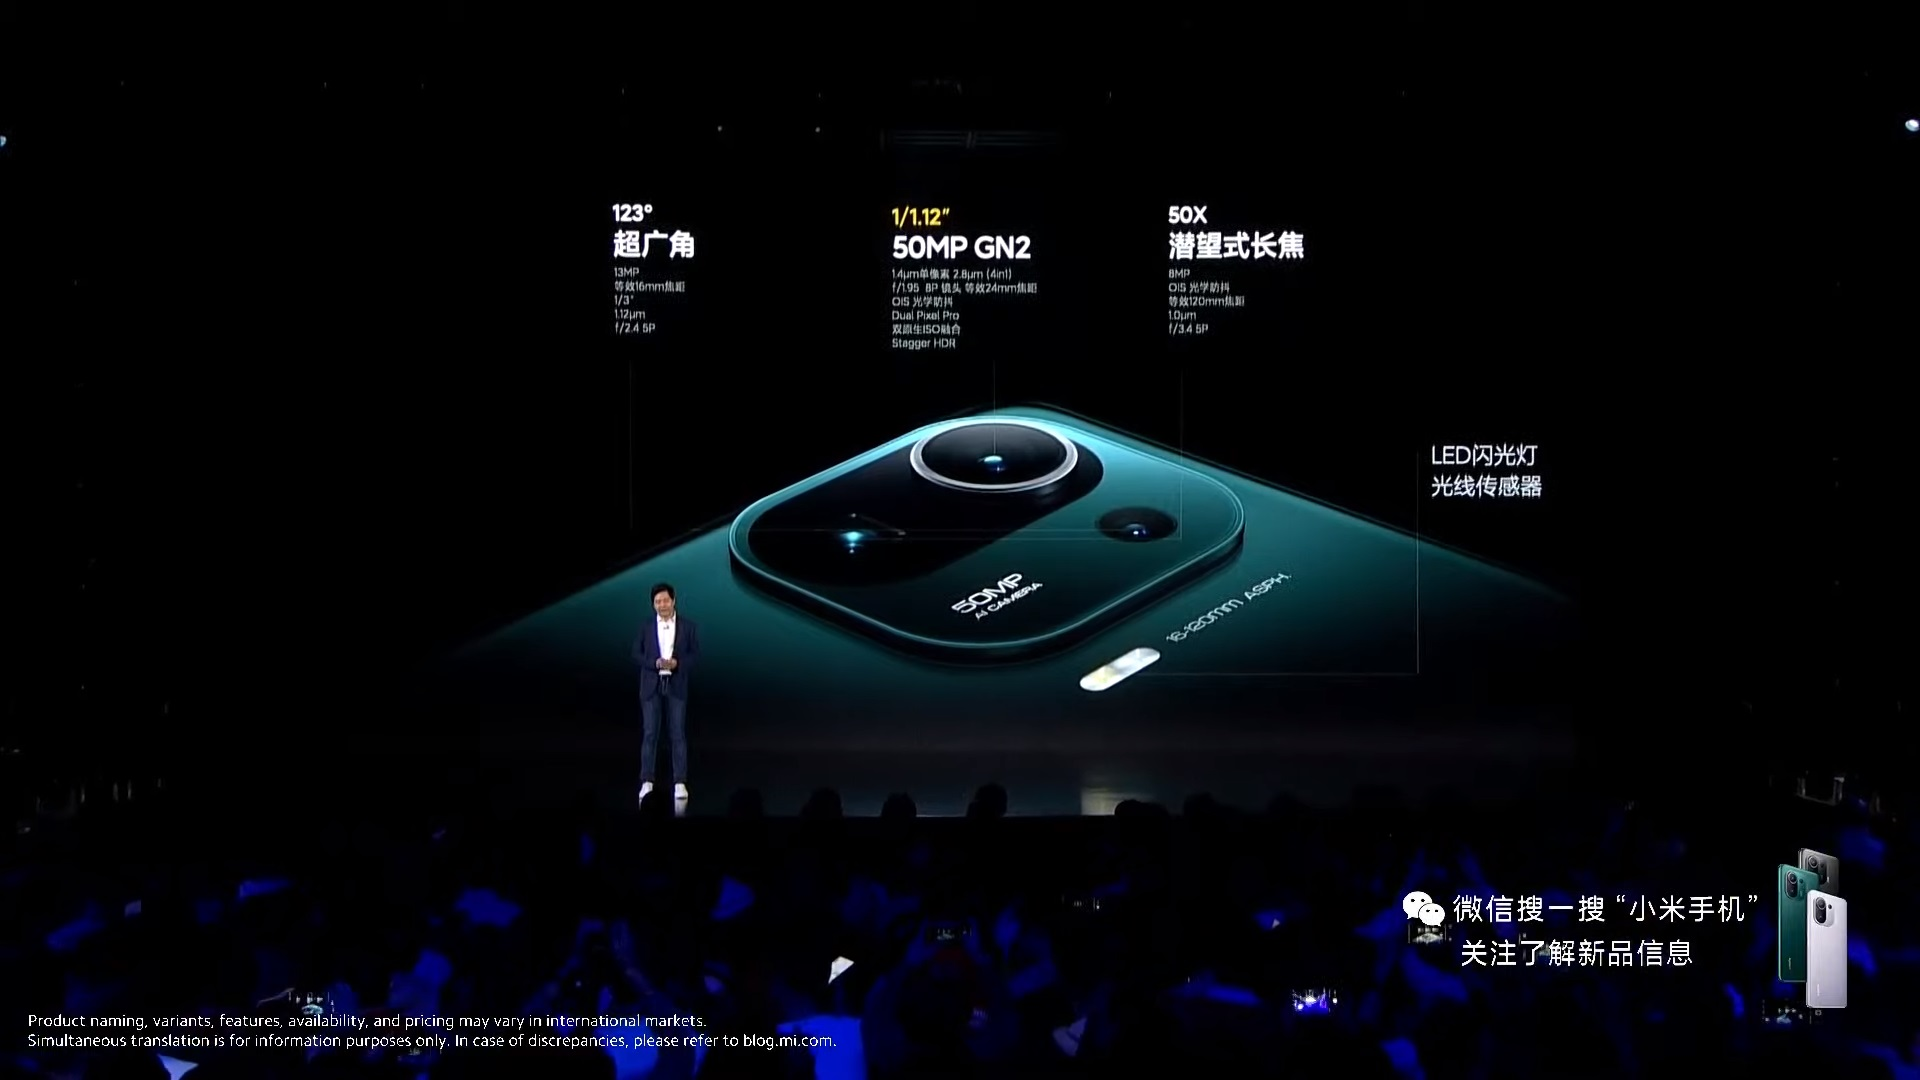 smartfon Xiaomi Mi 11 Pro smartphone